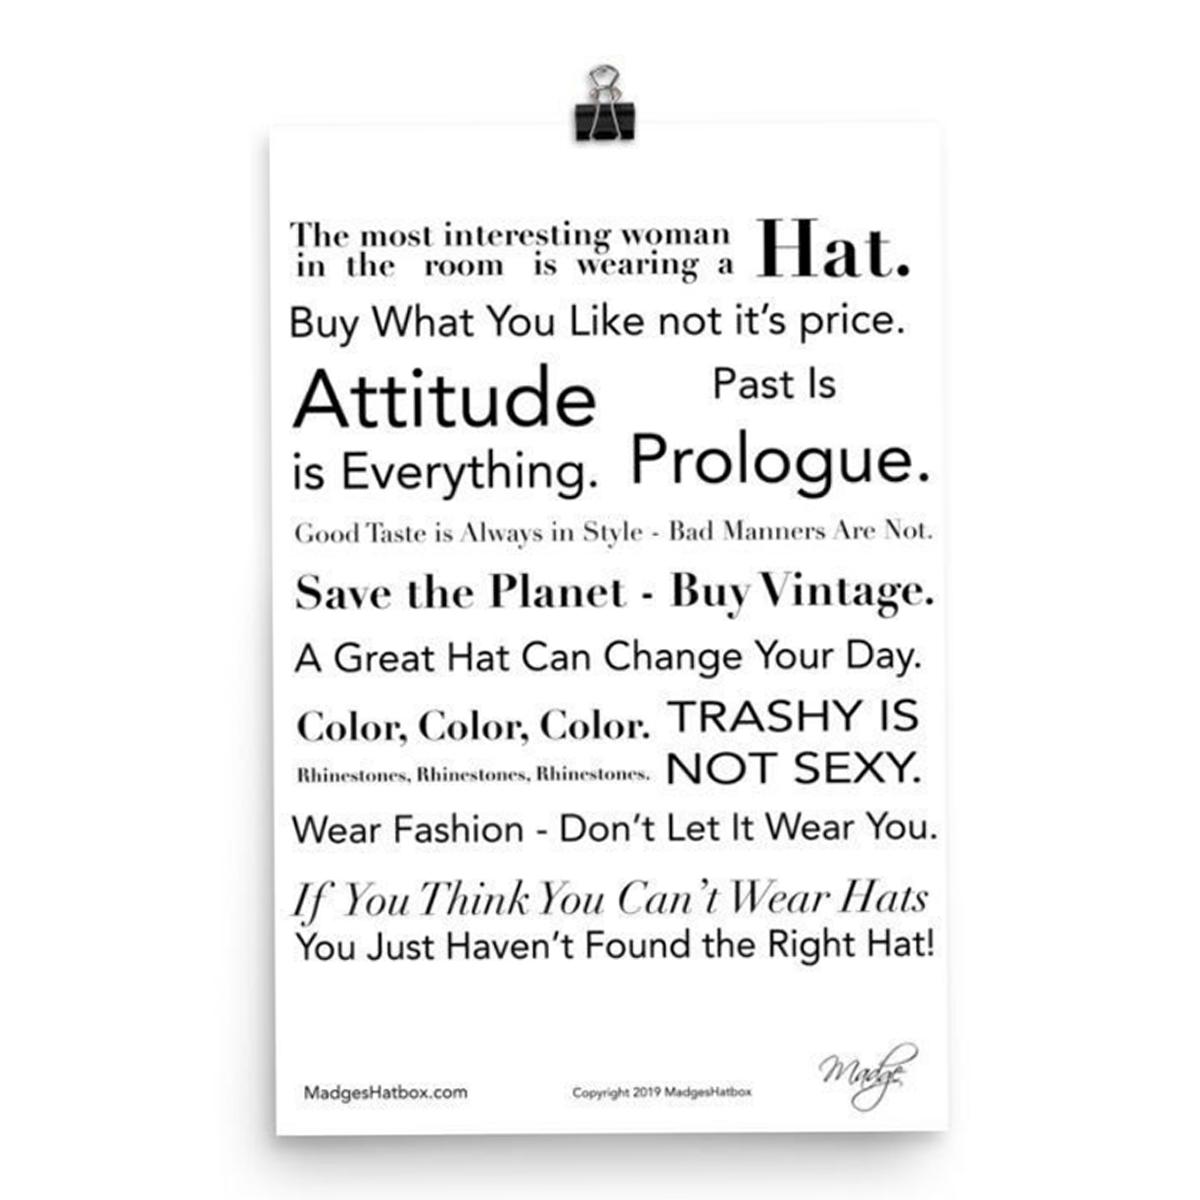 MadgesHatbox vintage poster